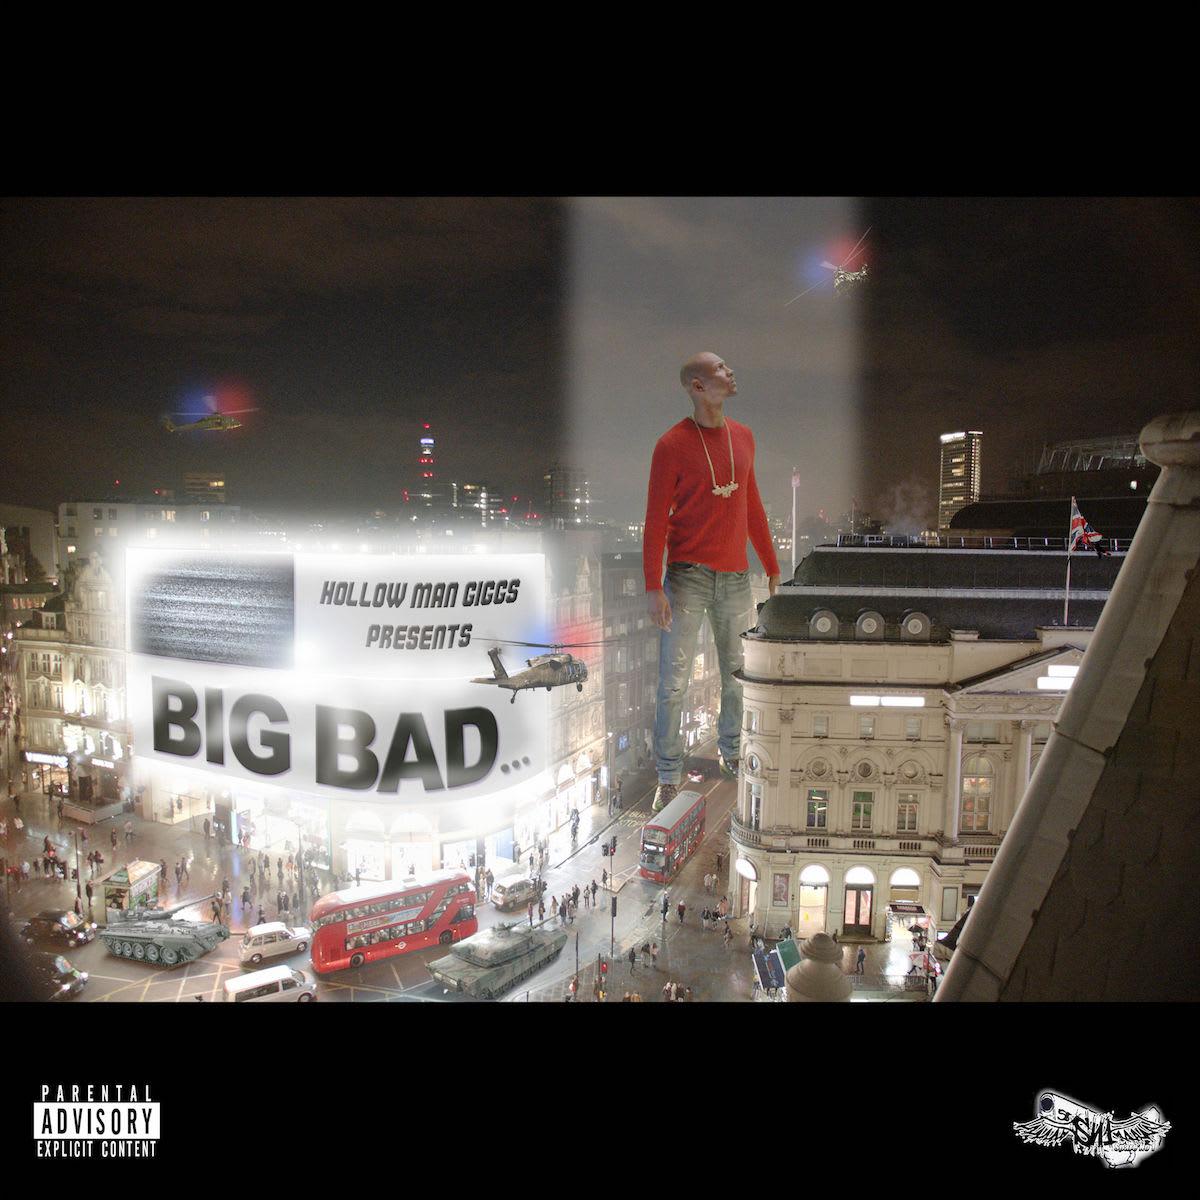 Listen To Giggs' Fifth Studio Album 'BIG BAD...'